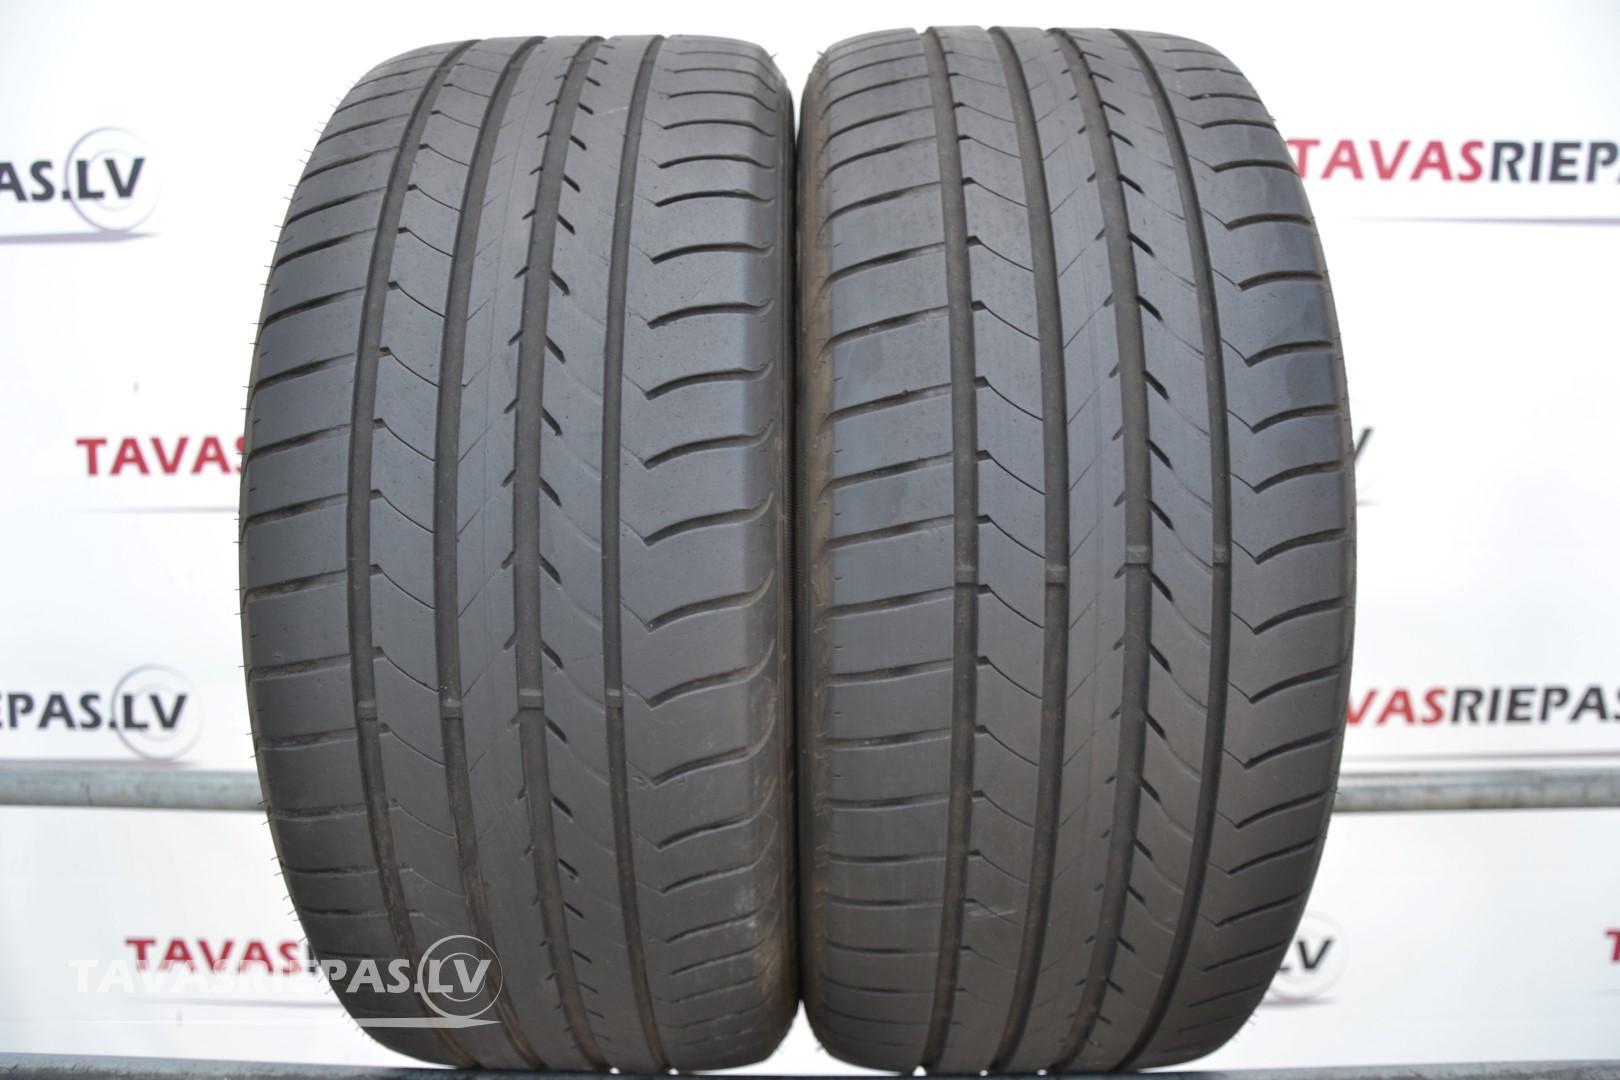 tires good year efficient grip 245 45 r17. Black Bedroom Furniture Sets. Home Design Ideas